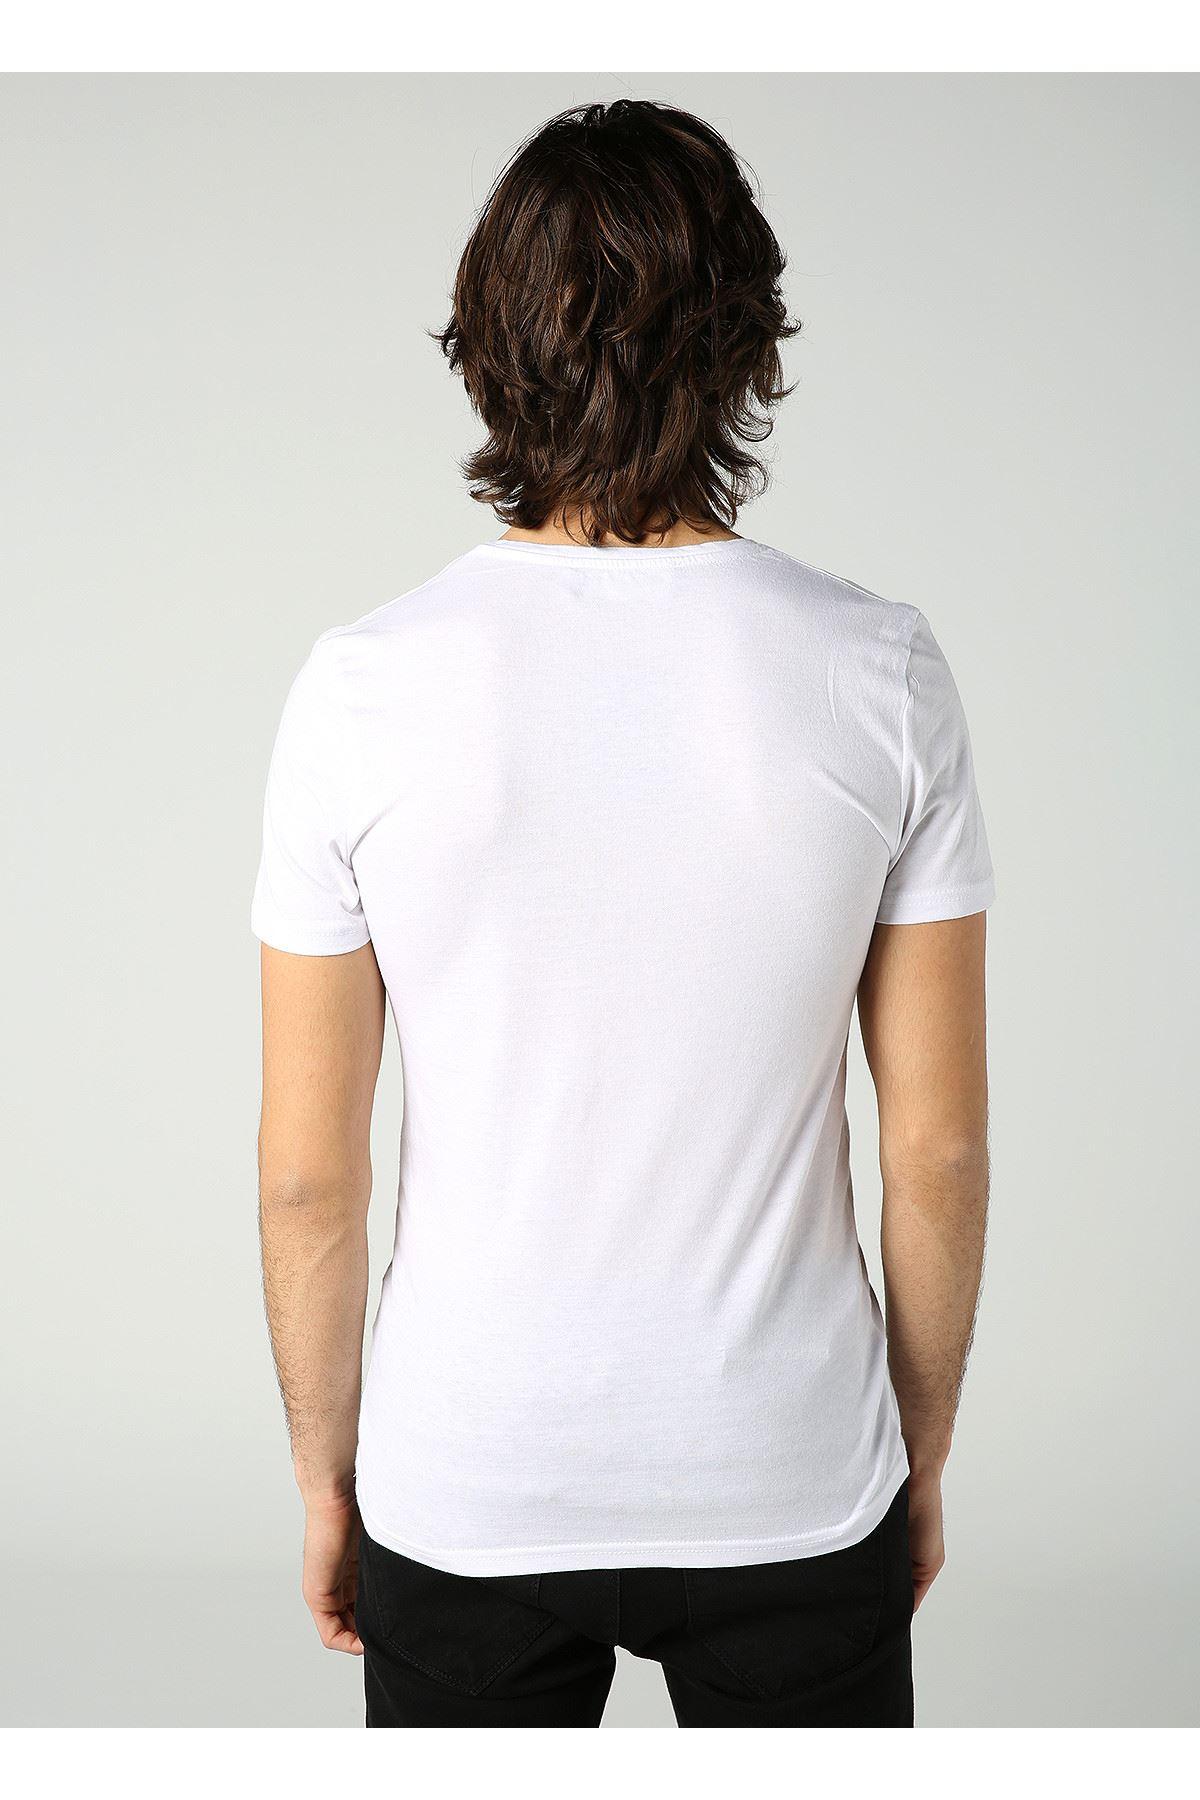 Bisiklet Yaka Cont Baskılı Erkek Beyaz T-Shirt